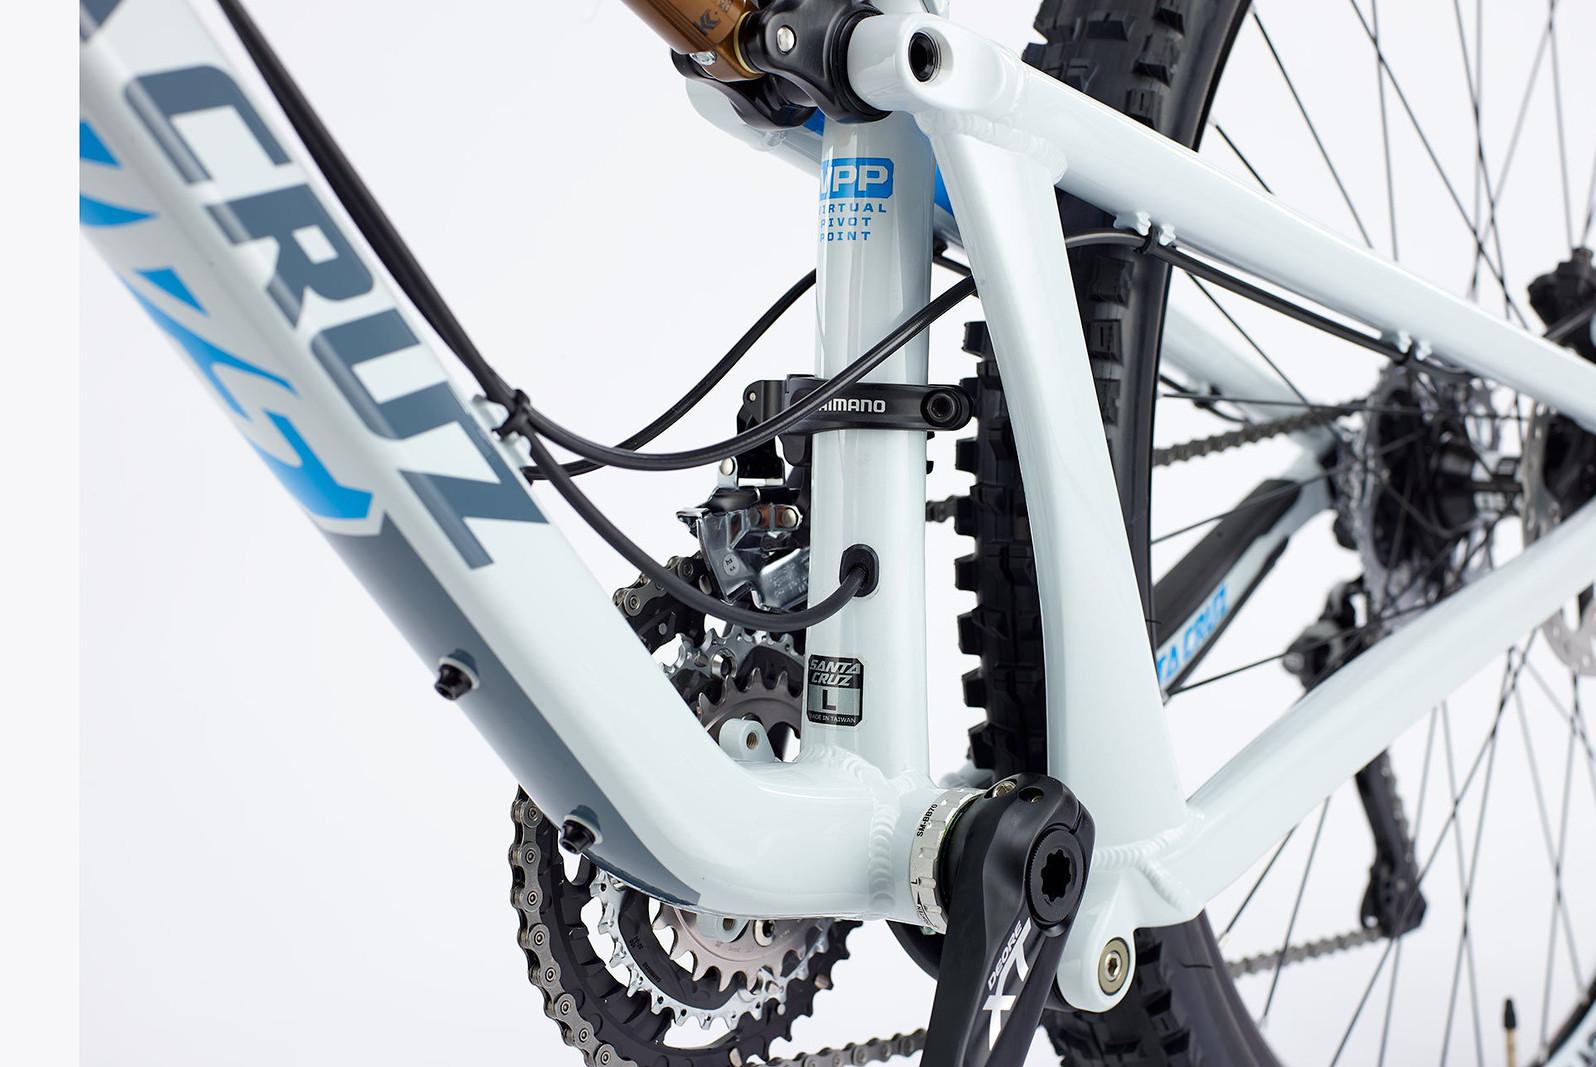 2014 Santa Cruz Bronson SPX AM Bike - Reviews, Comparisons, Specs ...